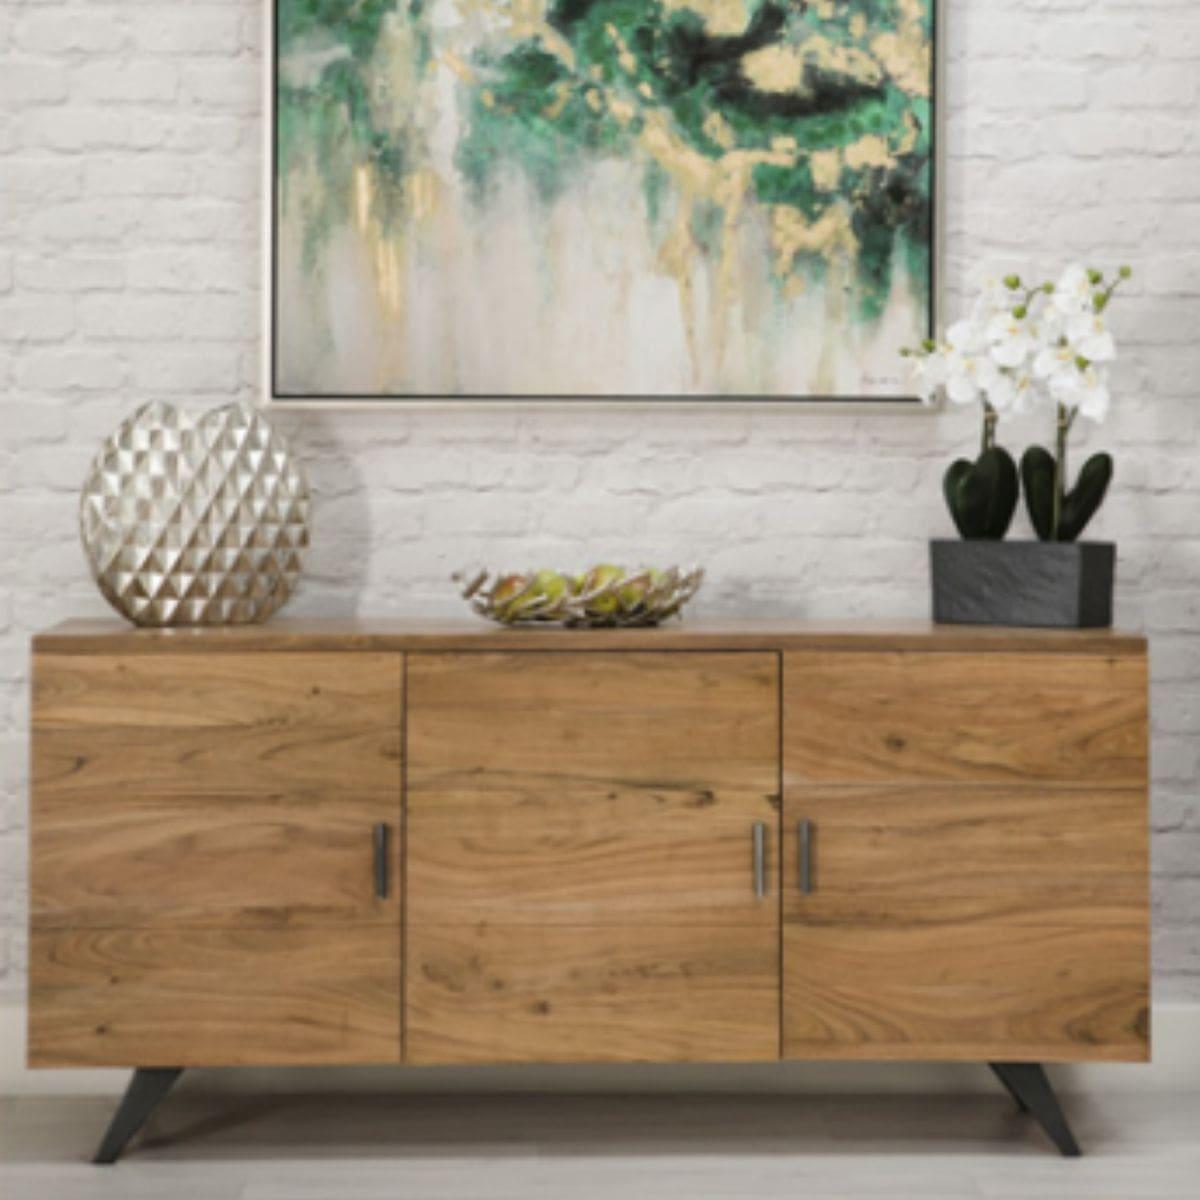 3 door wood and metal sideboard